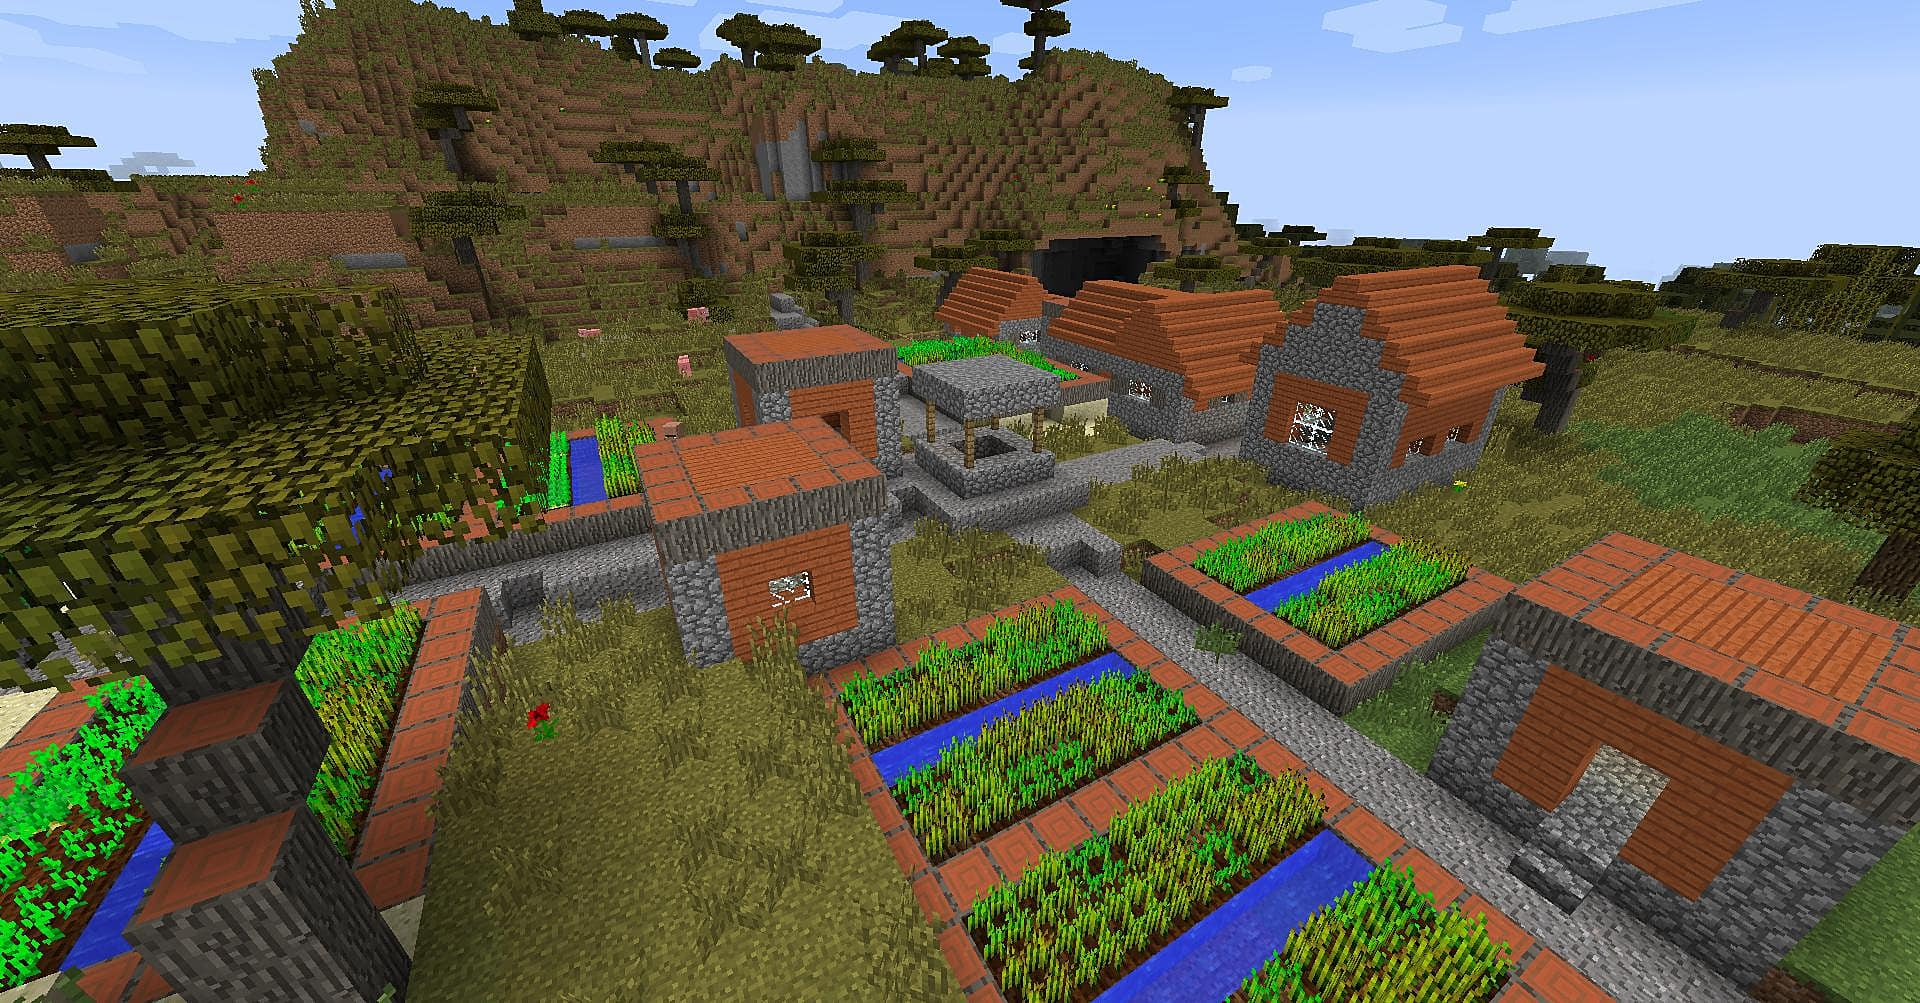 Minecraftの画像 p1_5